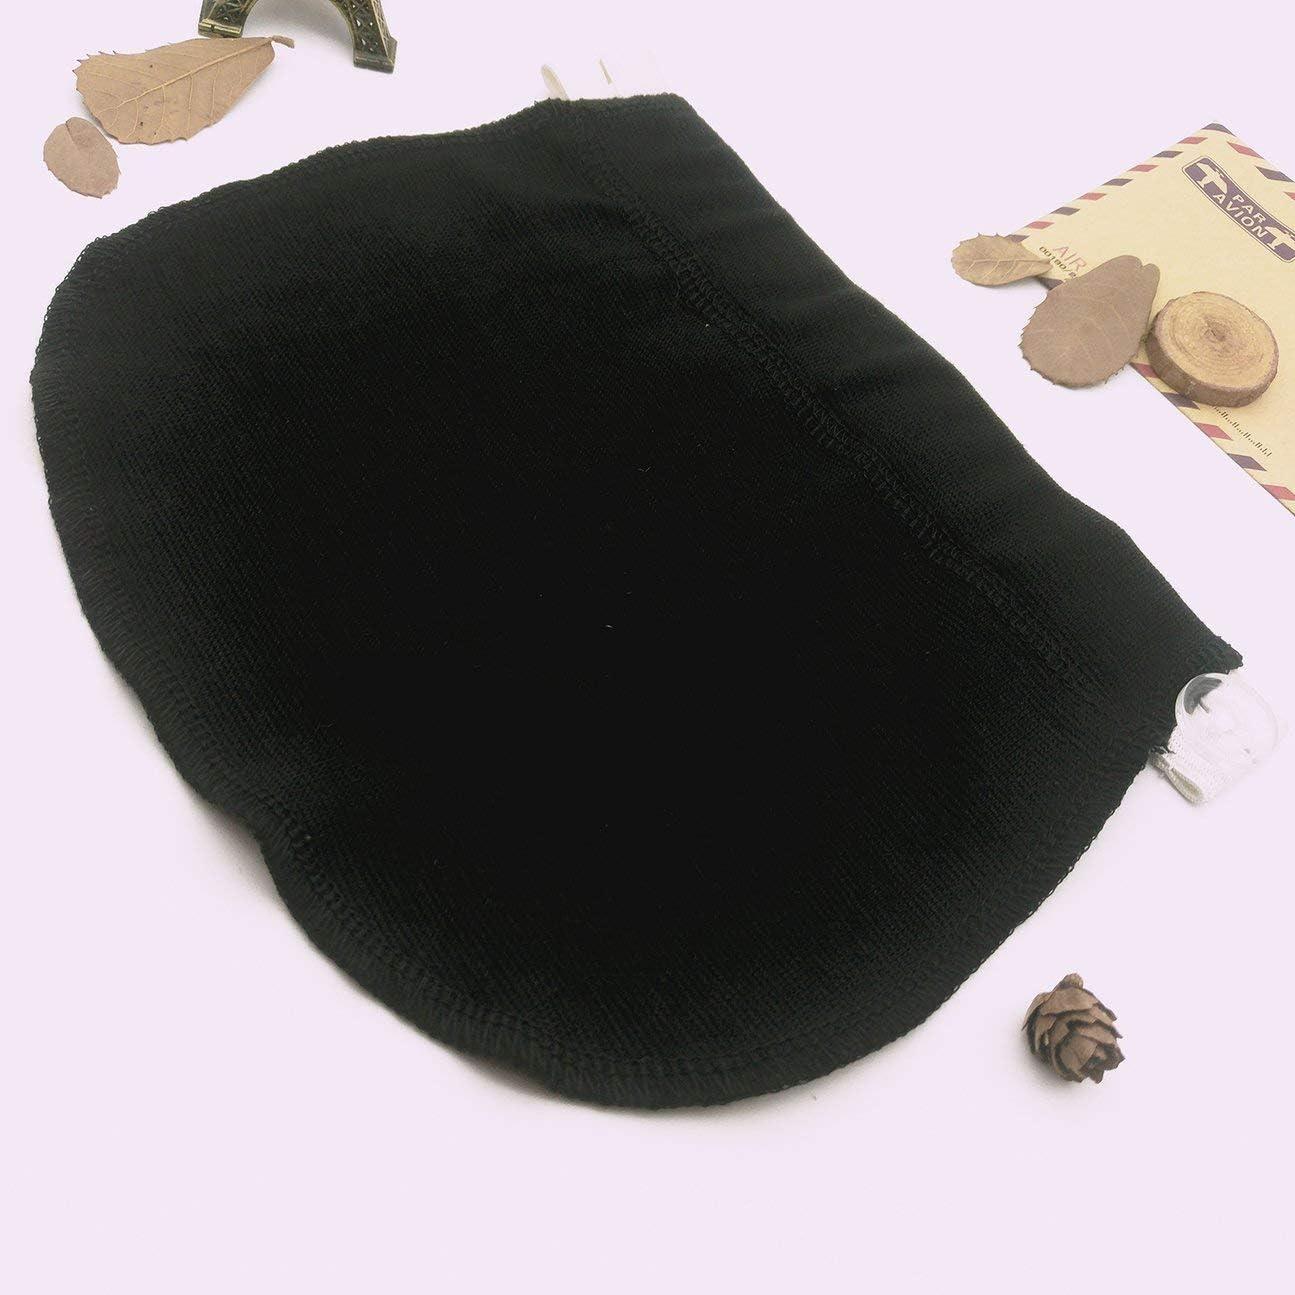 MachinYeser Maternity Pregnancy Waistband Belt Adjustable Elastic Waist Extender Clothing Pants for Pregnant Color:Black